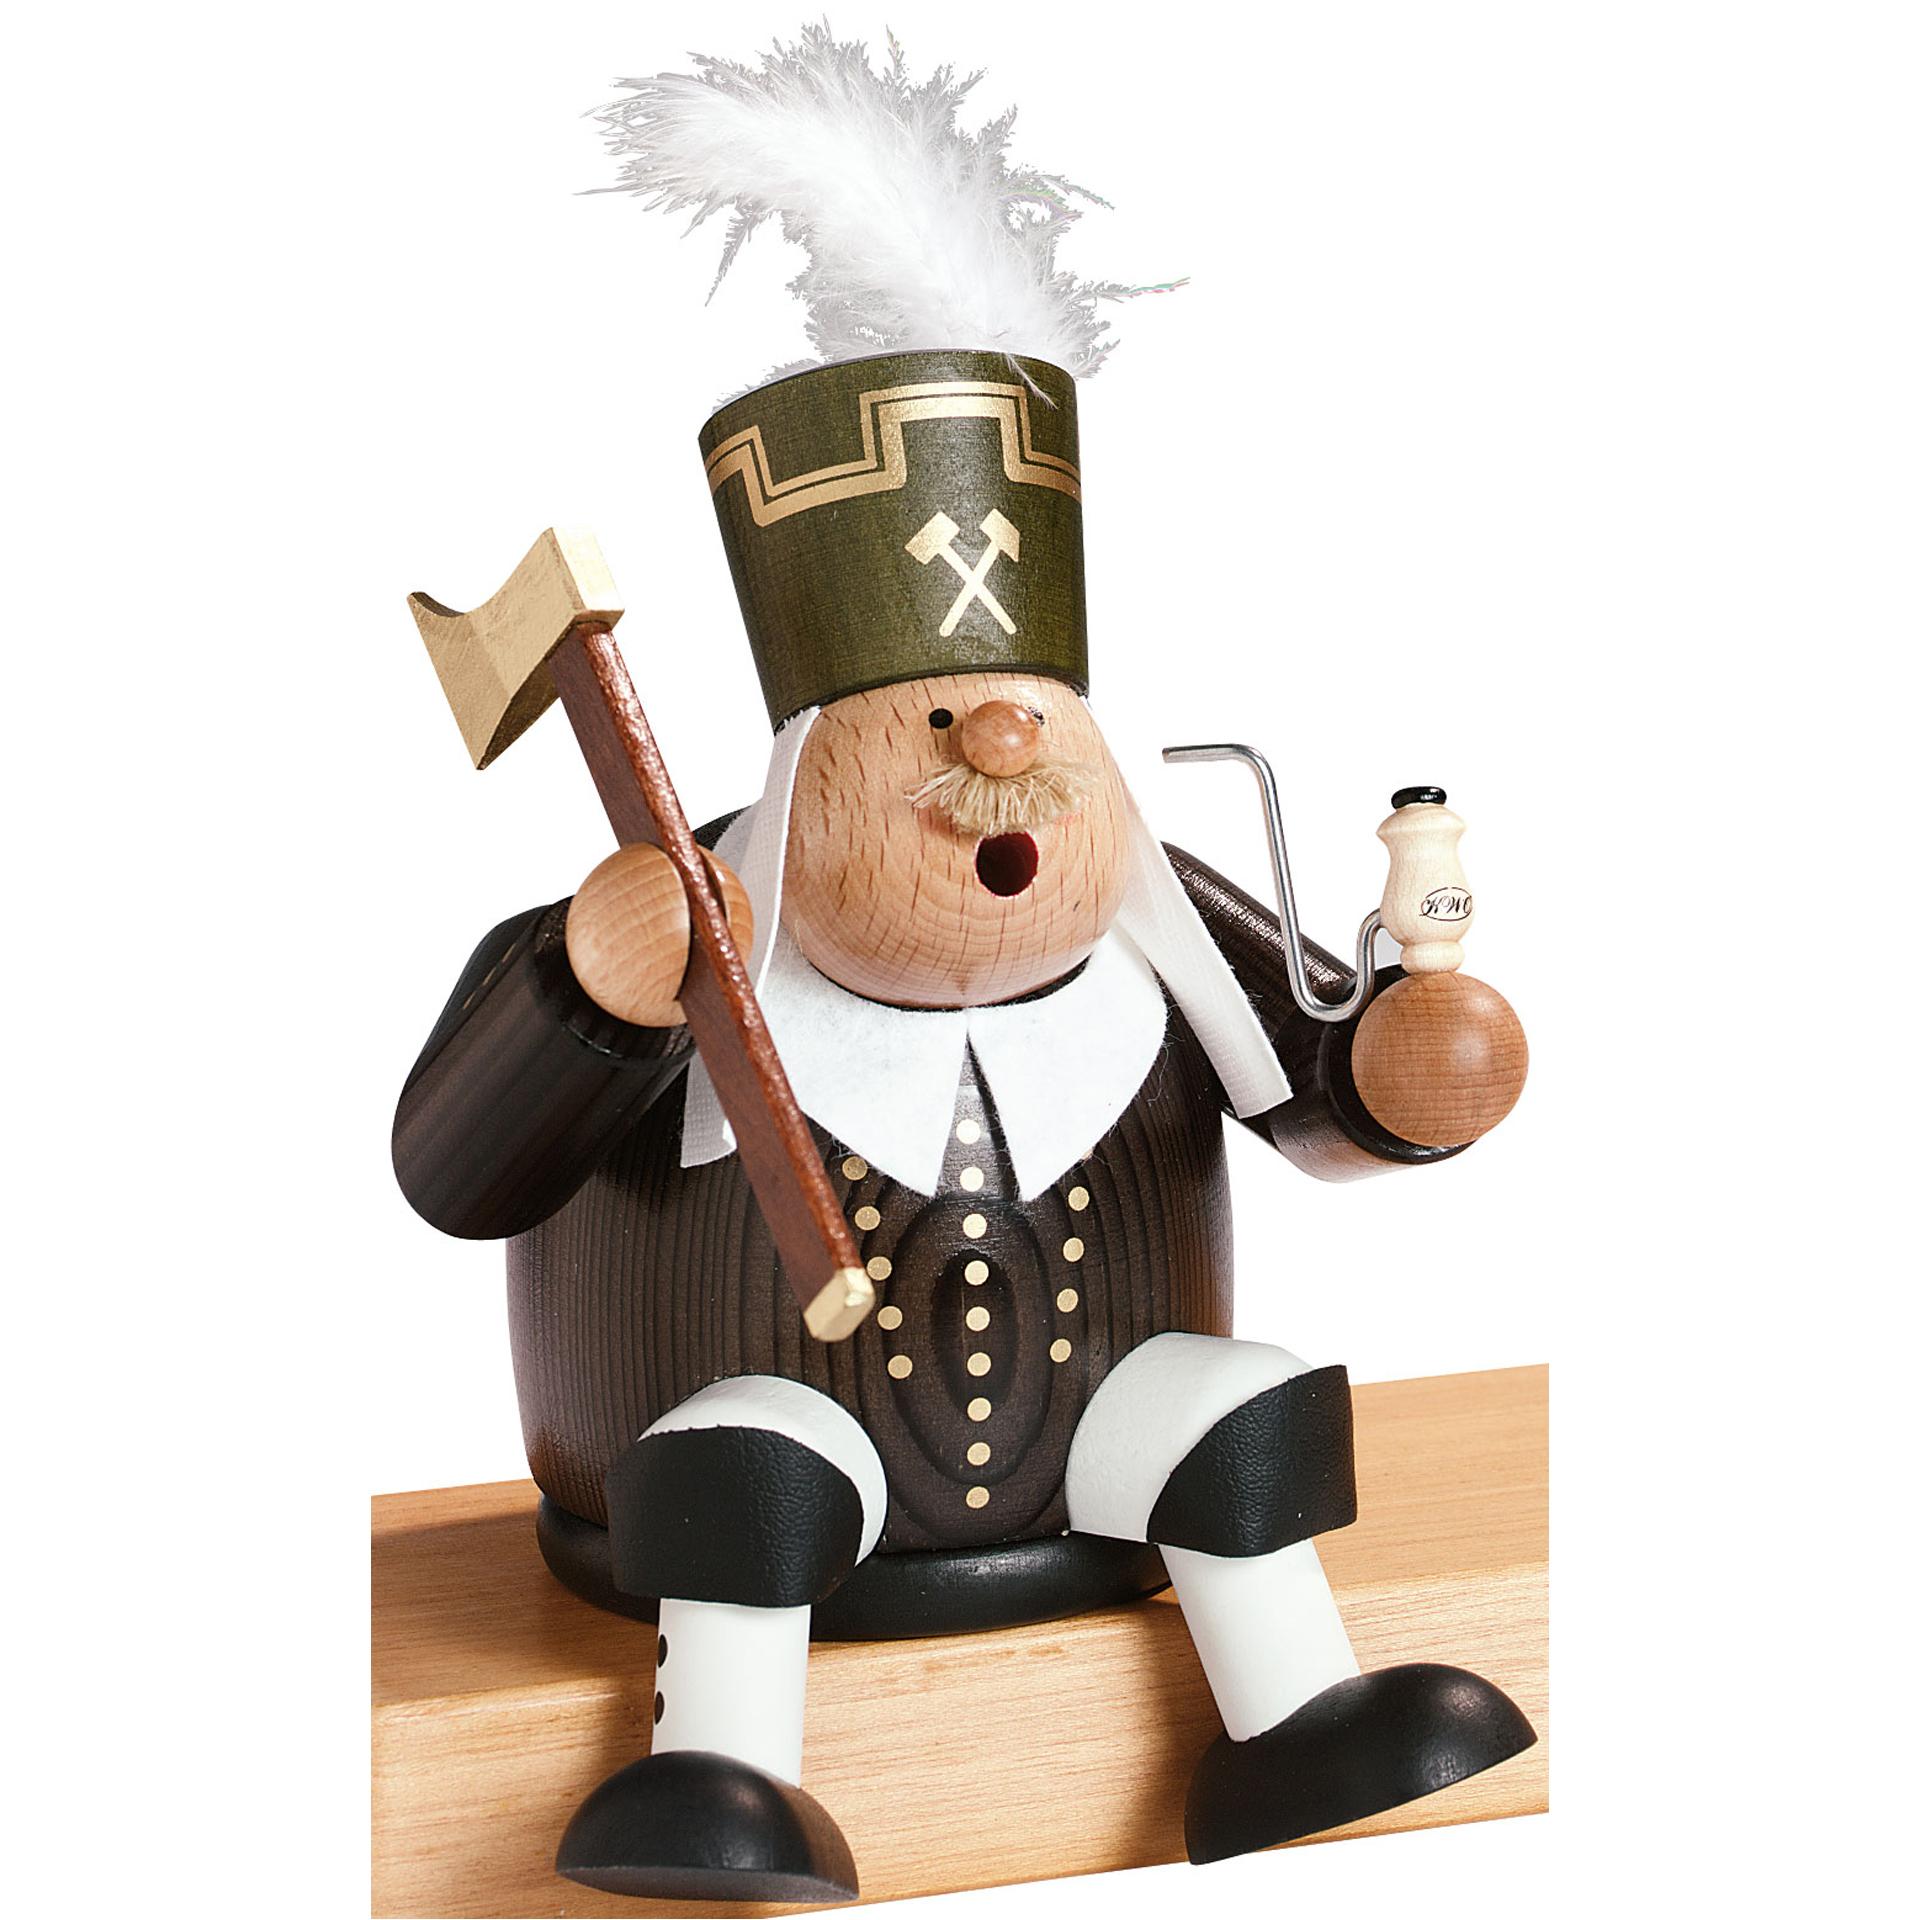 Rauchfigur Bergmann